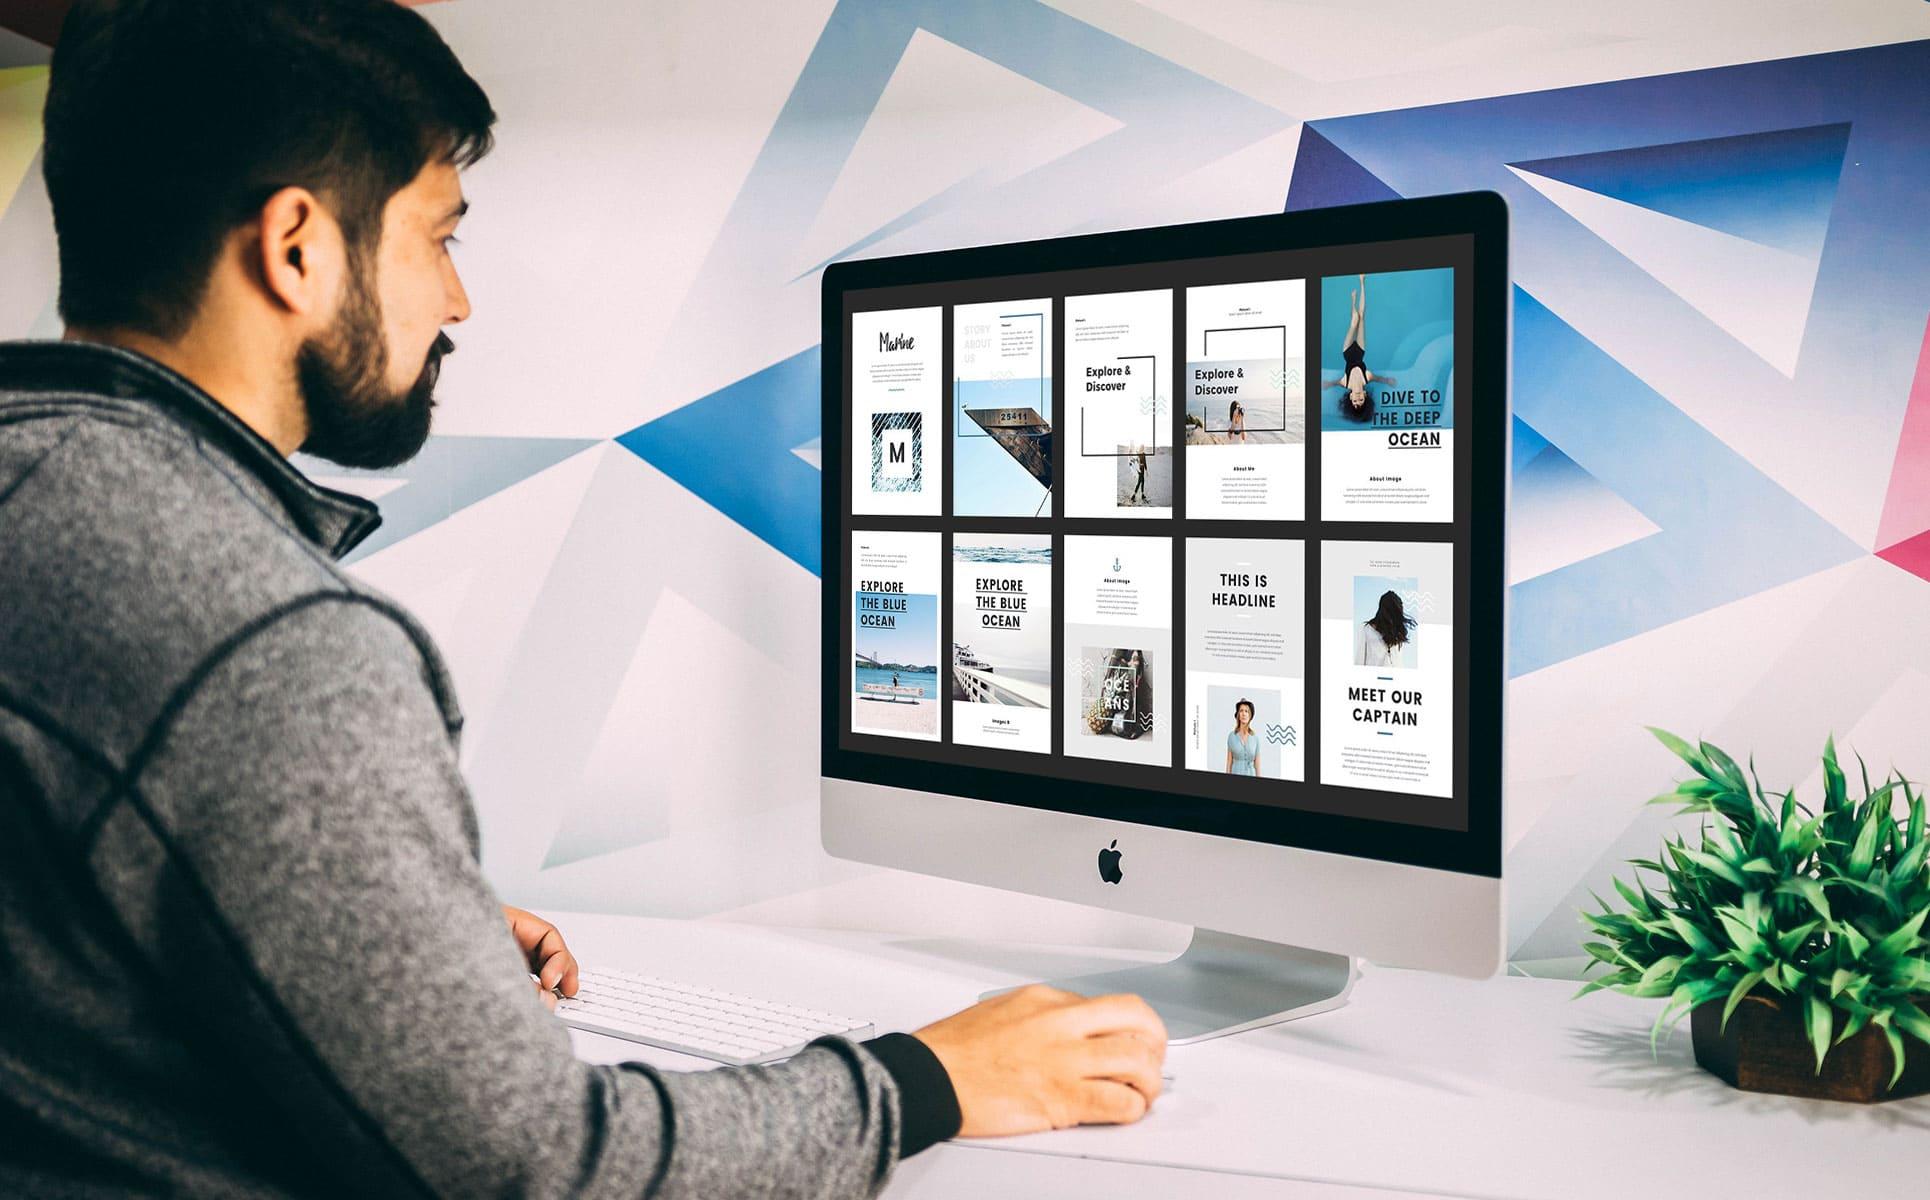 Nautical - A4 Printable PowerPoint by MasterBundles Desktop preview mockup image.